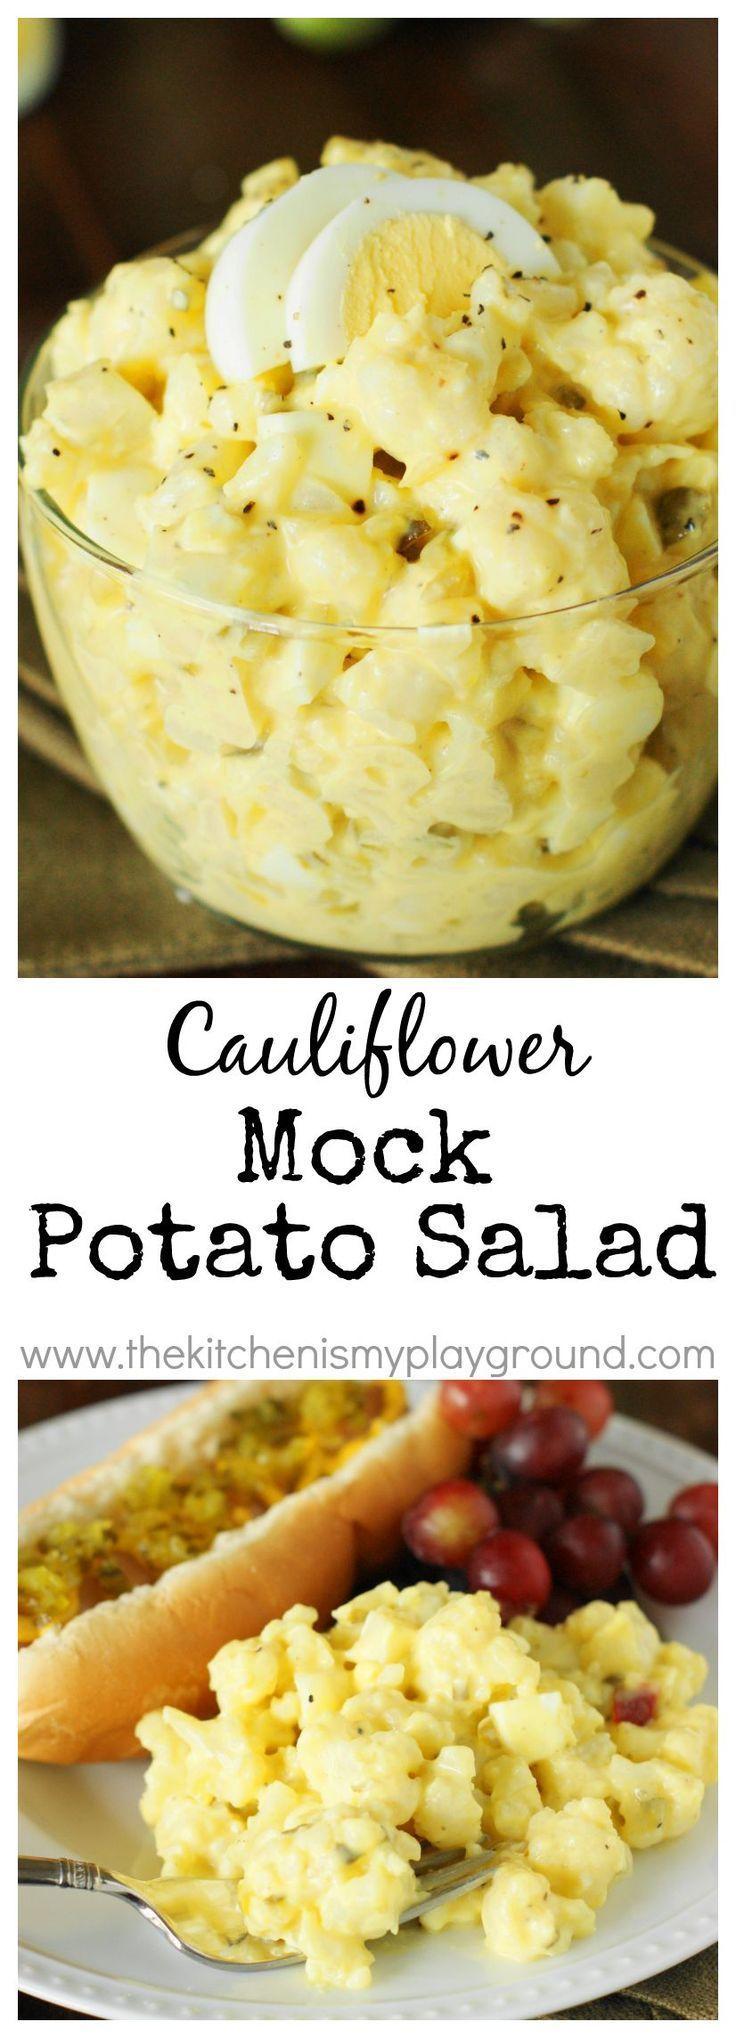 Cauliflower Mock Potato Salad ~ a full-of-flavor lower-carb version of our beloved potato salad! www.thekitchenism...